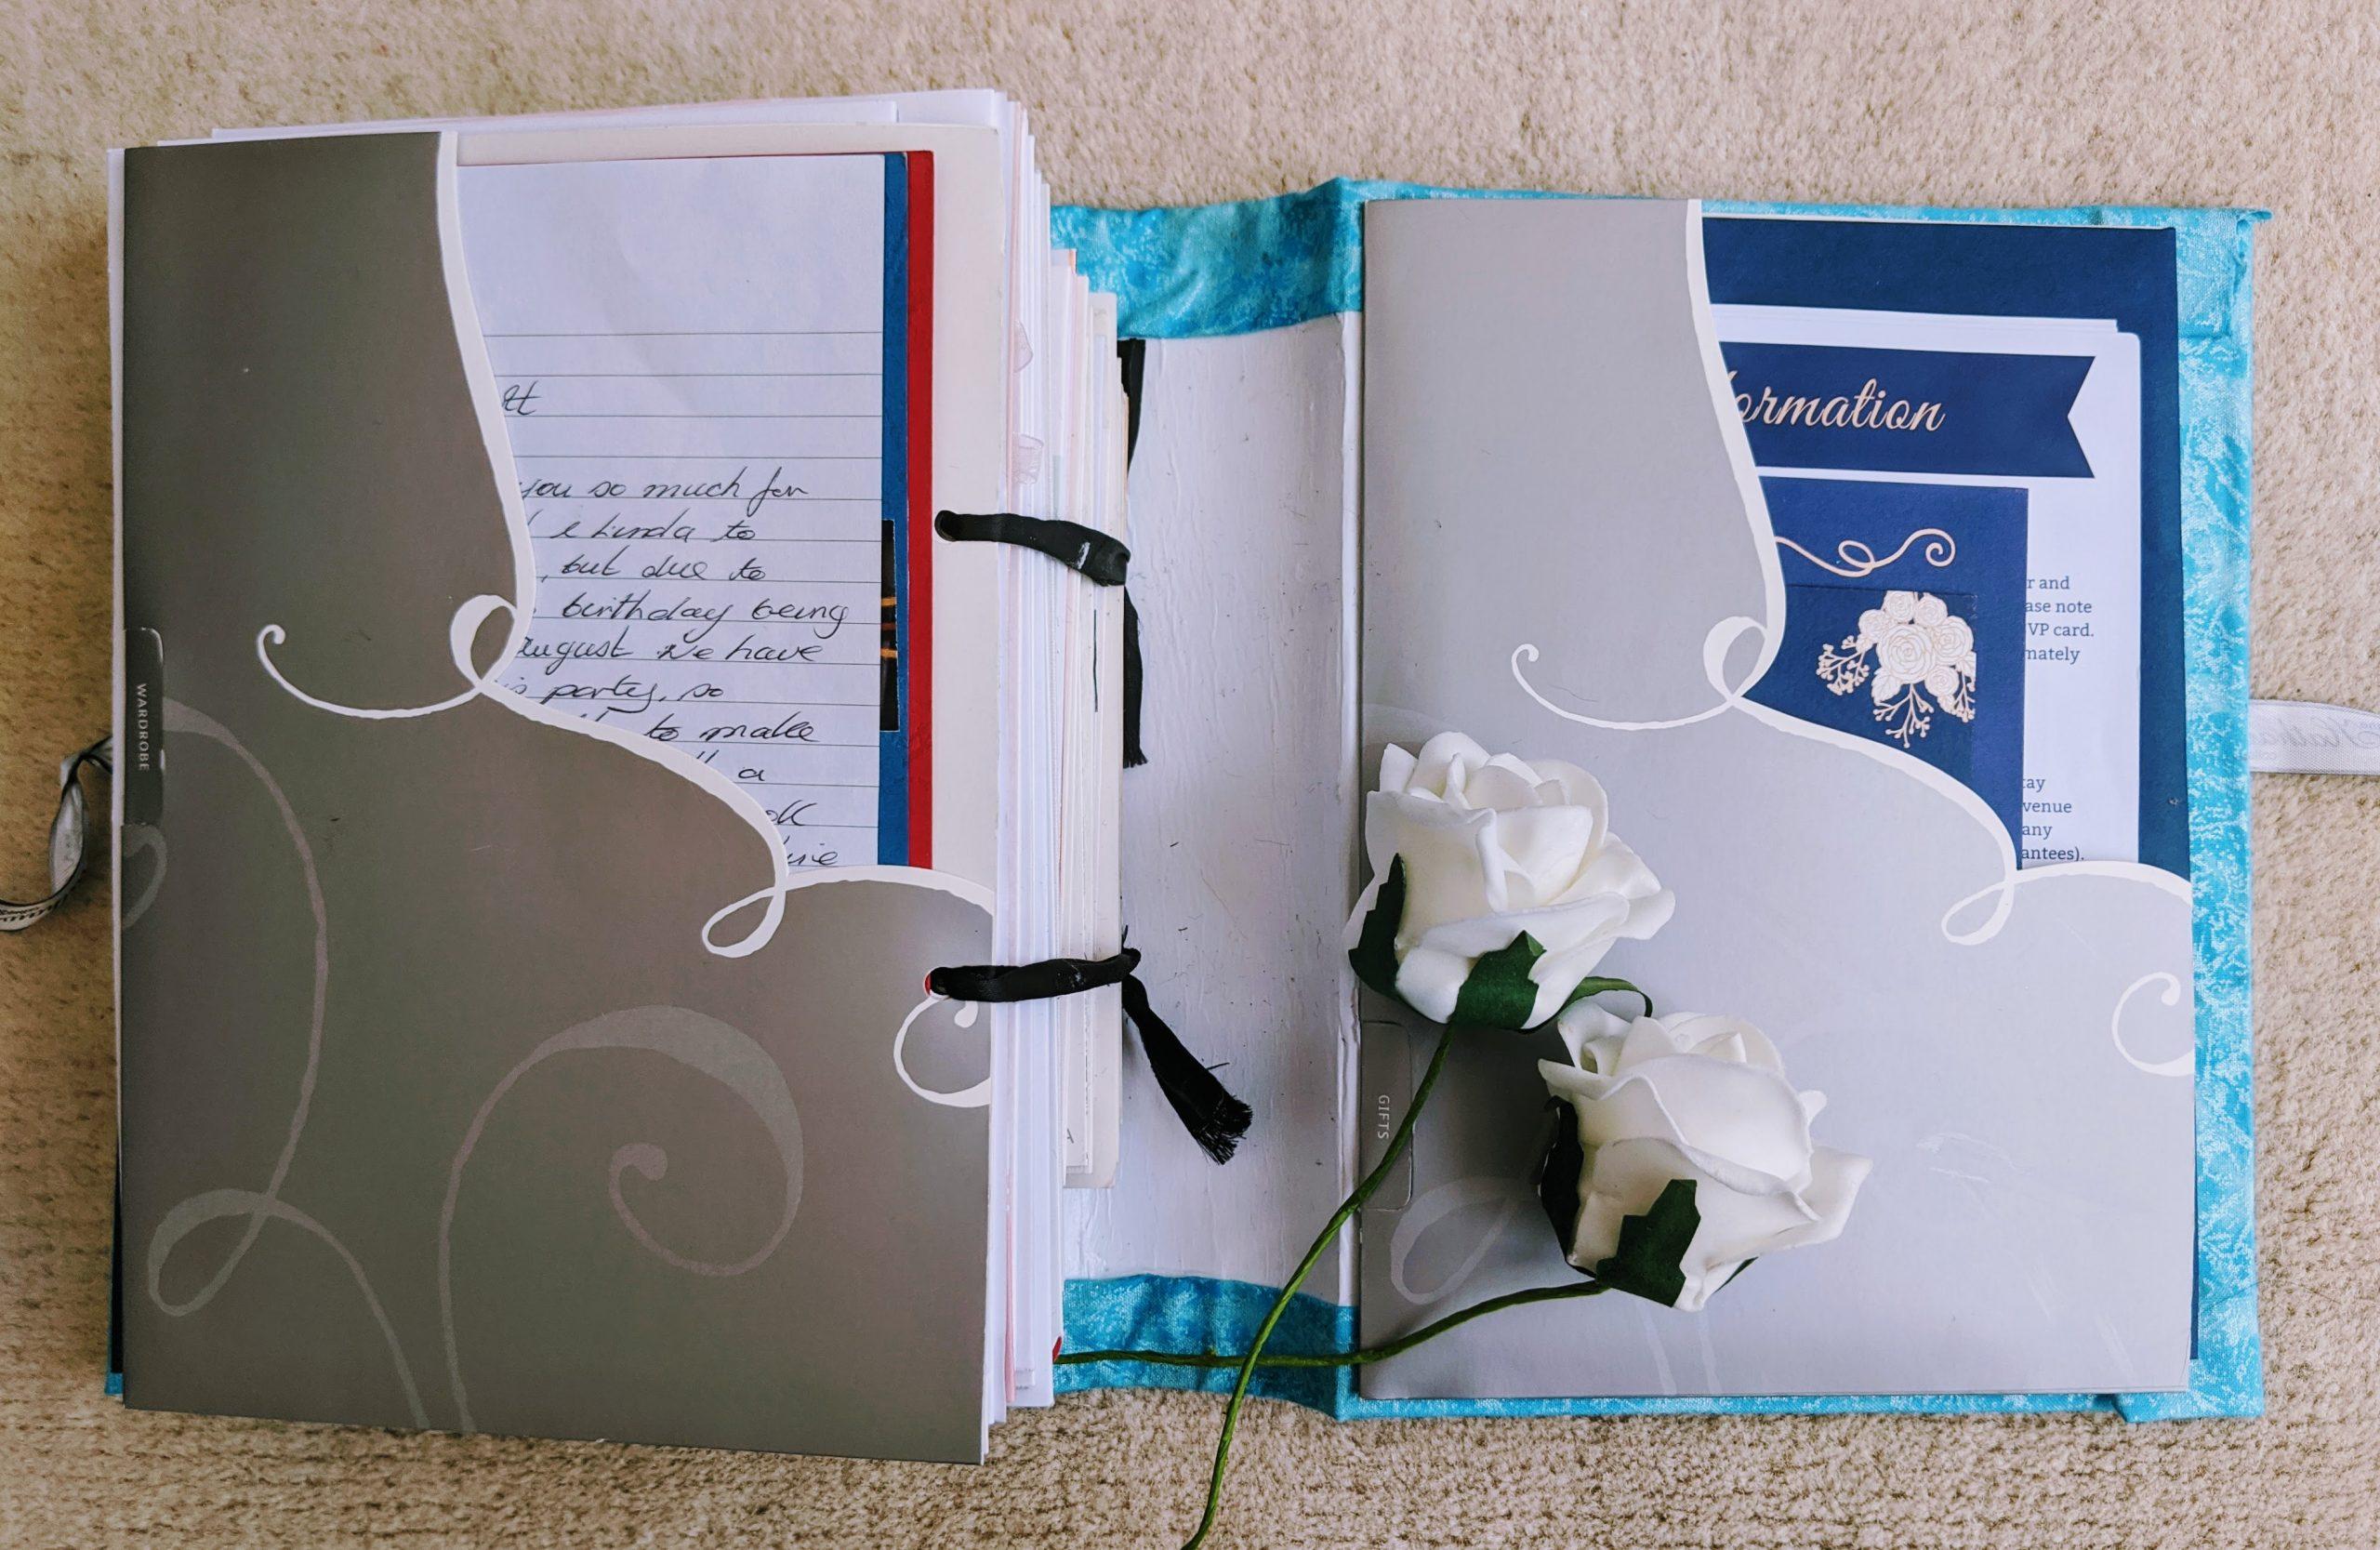 Repurposed pockets inside our wedding card keepsake book